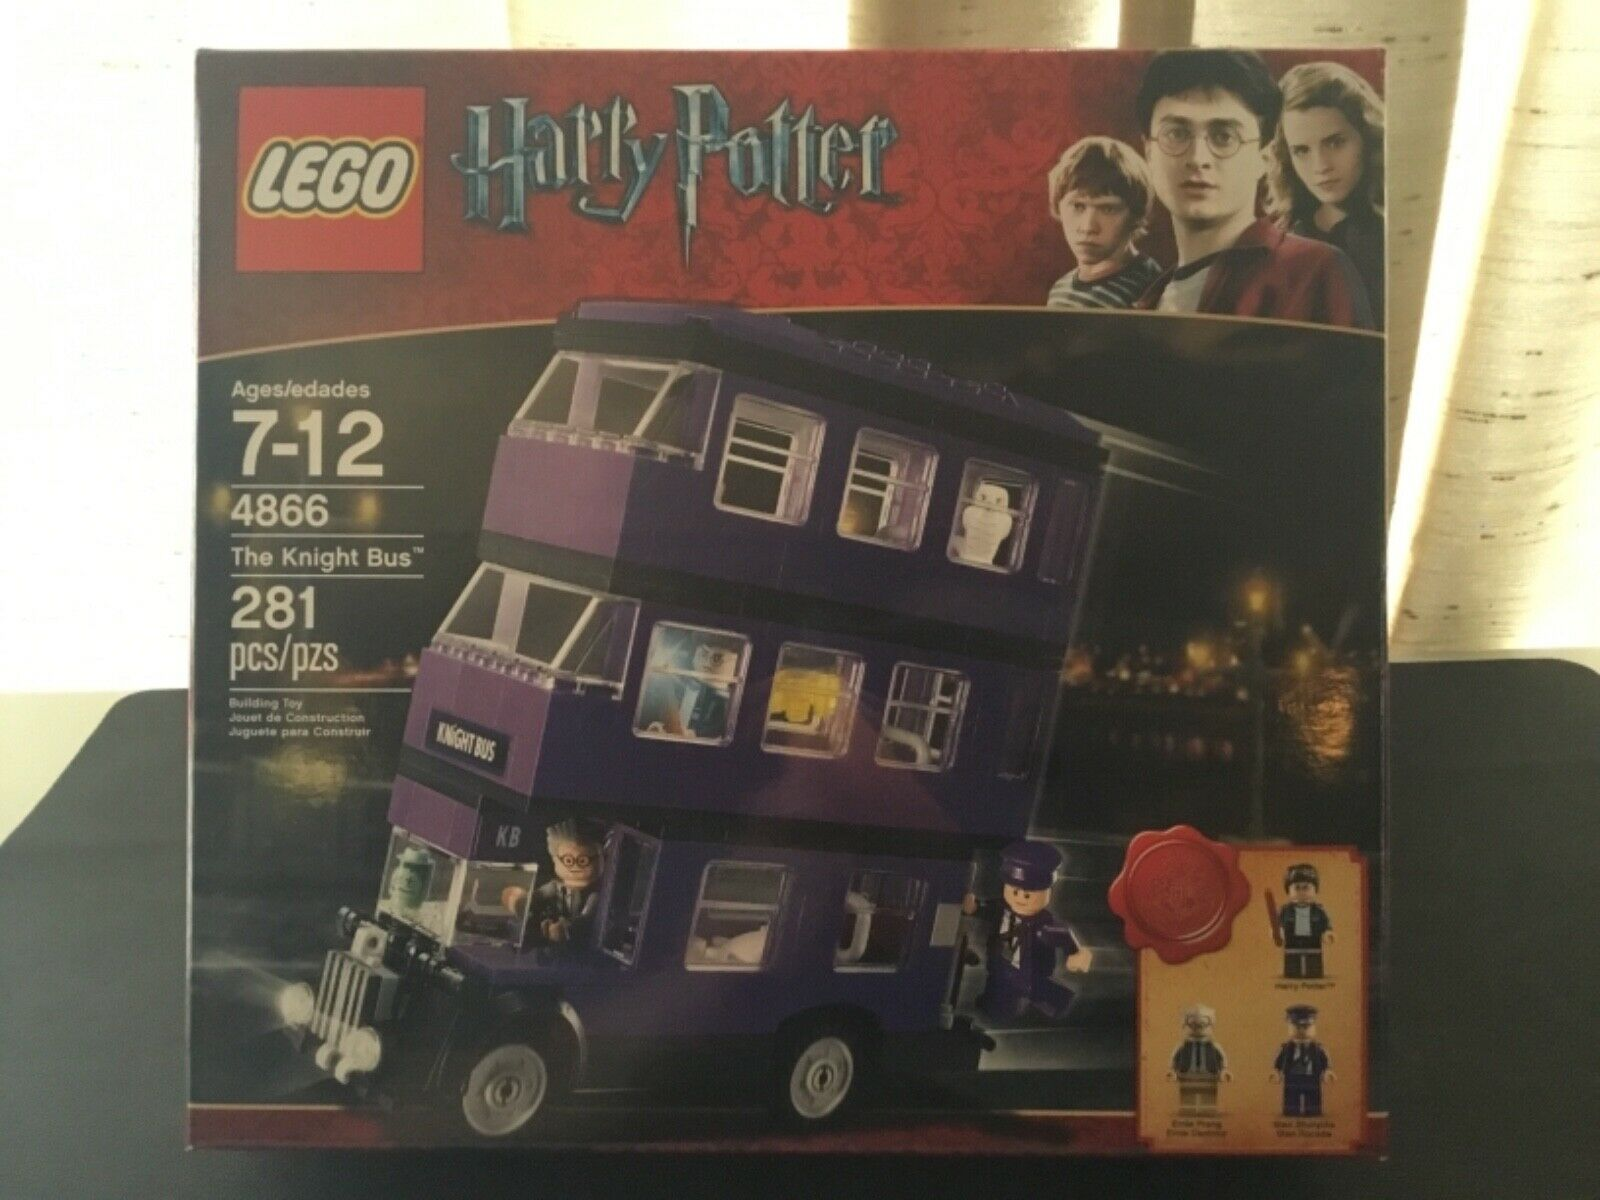 Lego Harry Potter El Caballero Bus 4866 Ernie Prang danlmur Stan Shunpike Rocade